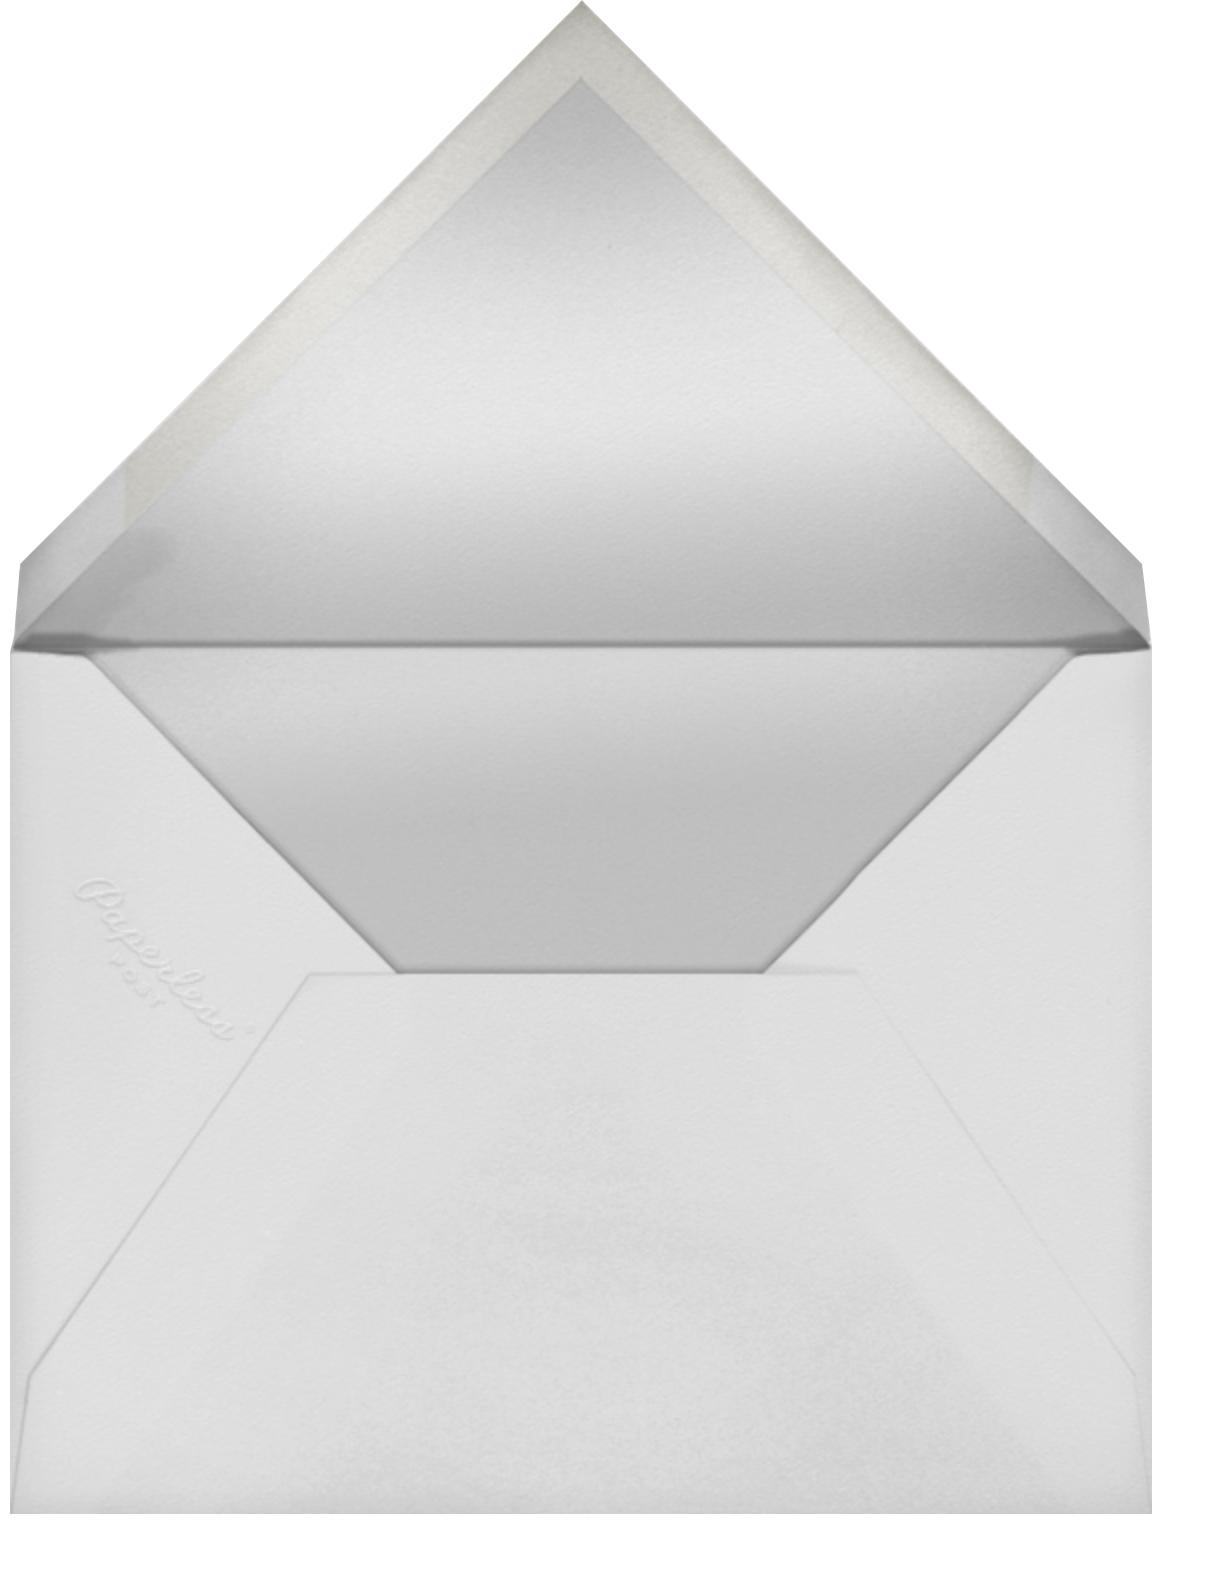 Egret Garden (Program) - Rifle Paper Co. - Menus and programs - envelope back